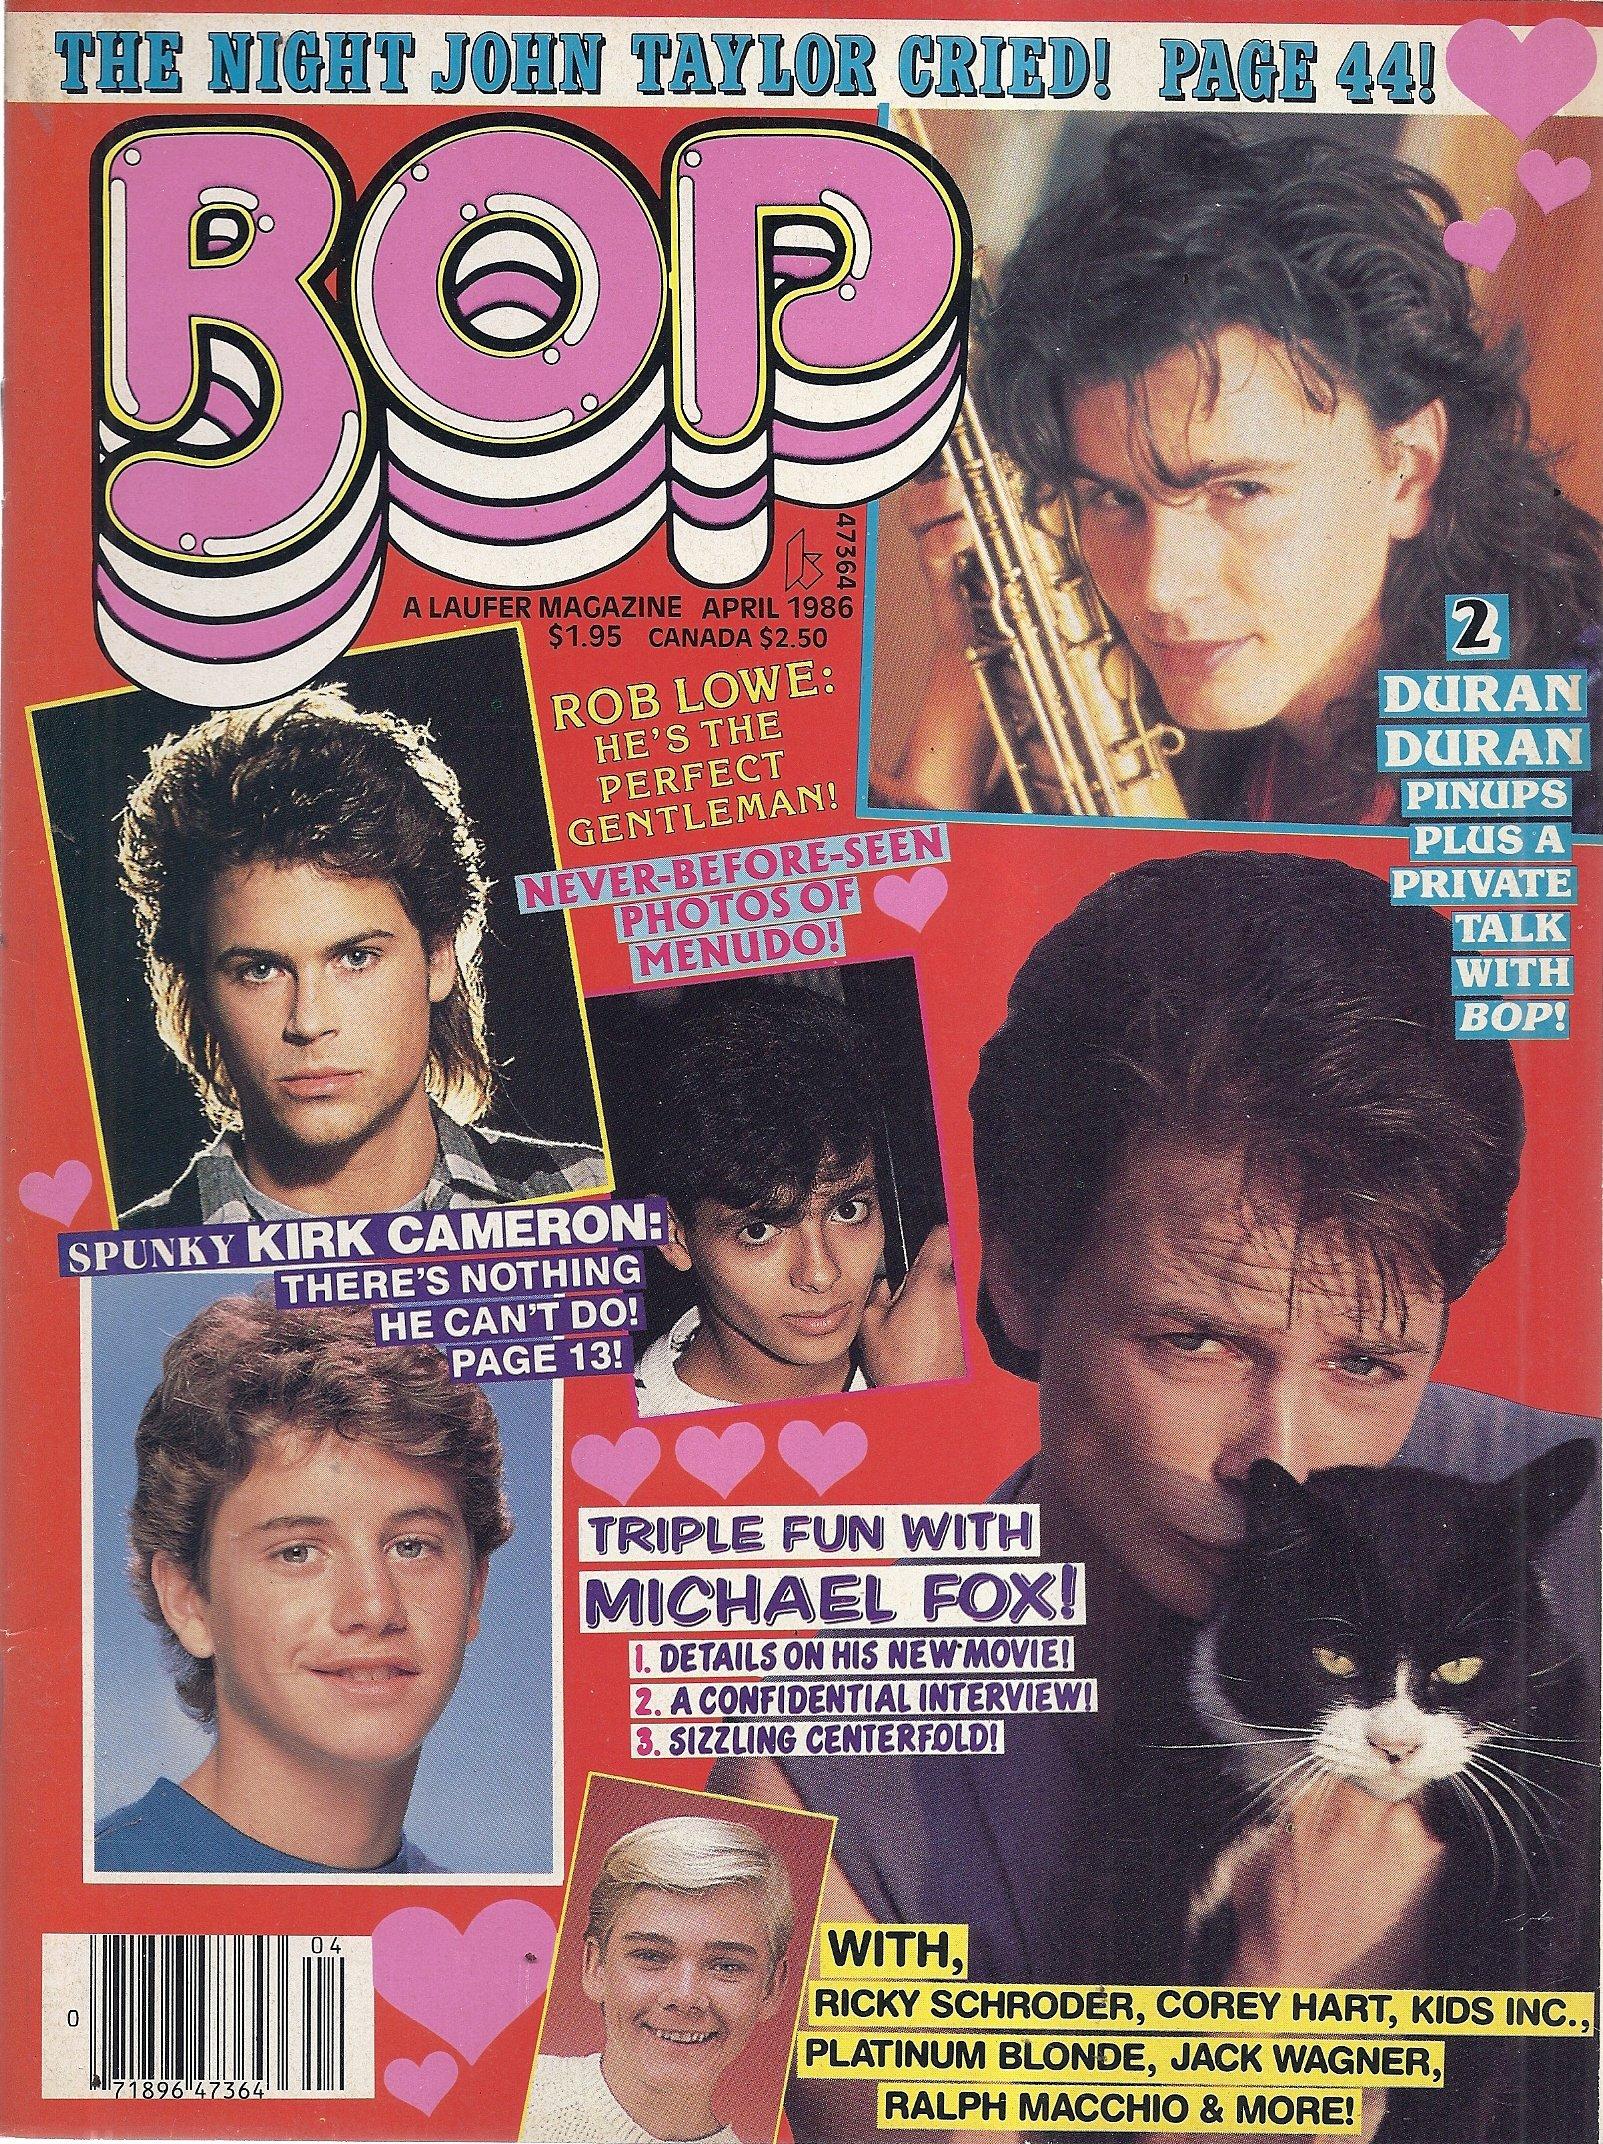 Bop Magazine (April 1986 - Duran Duran, Michael Fox, Kirk